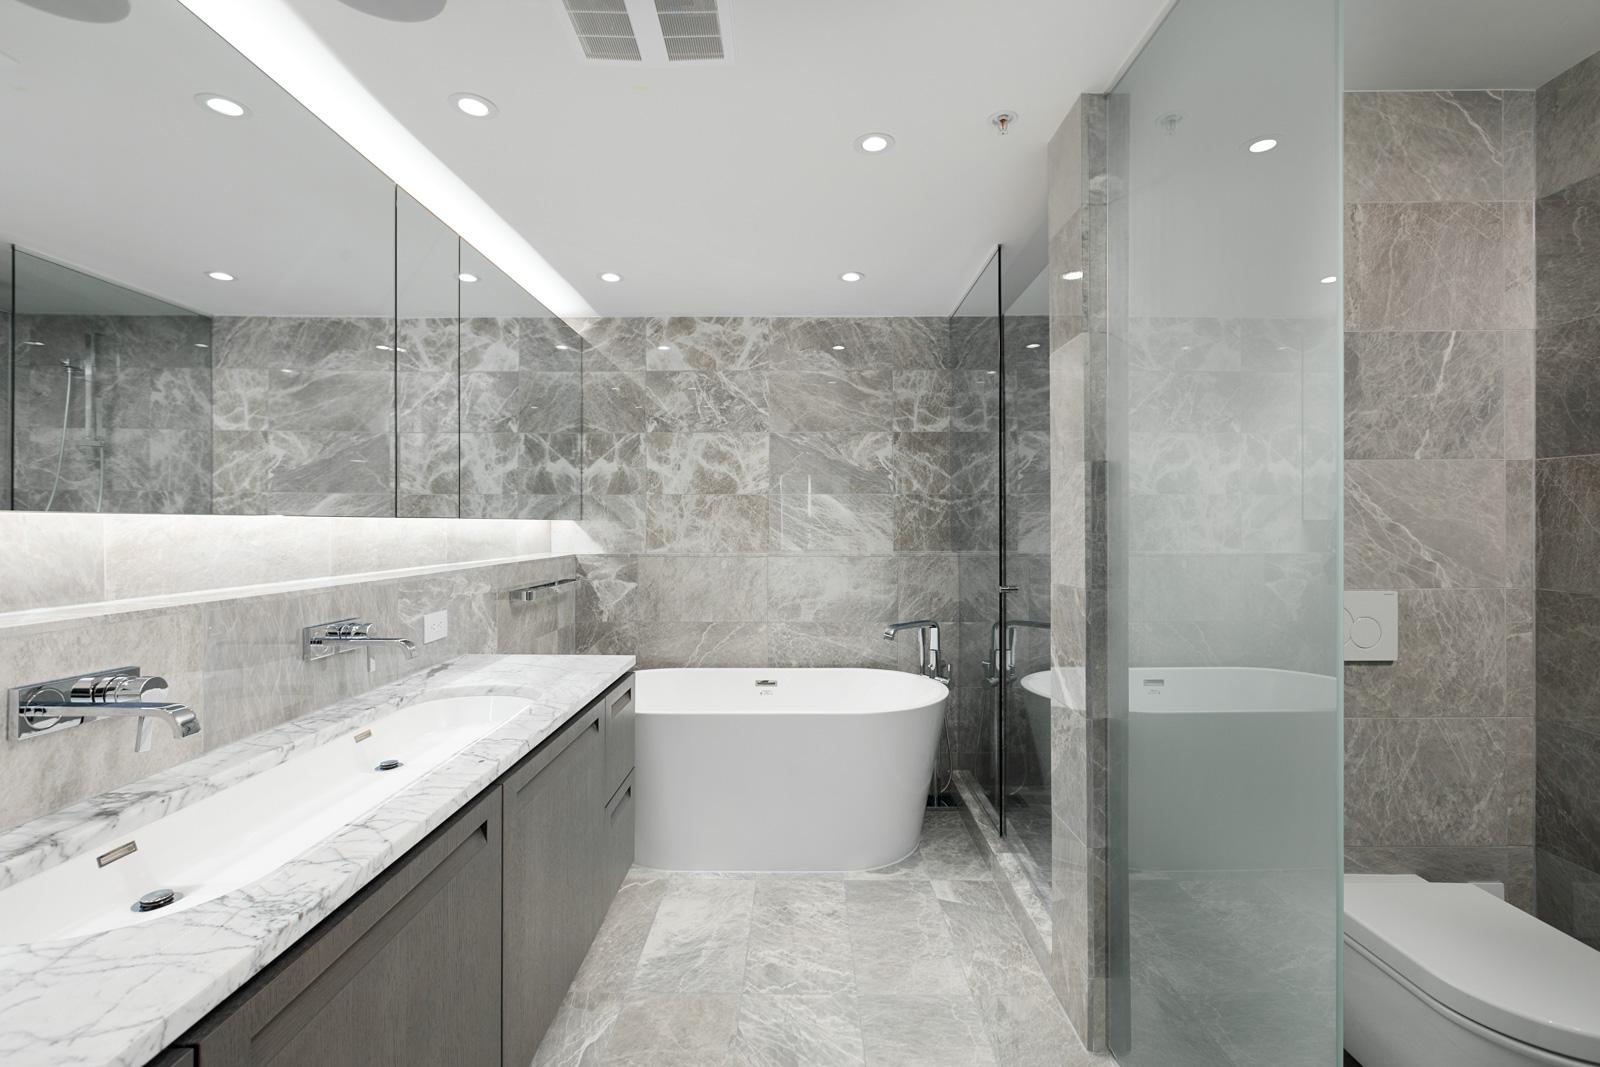 Bathroom with marbled grey tile inside luxury Vancouver rental.